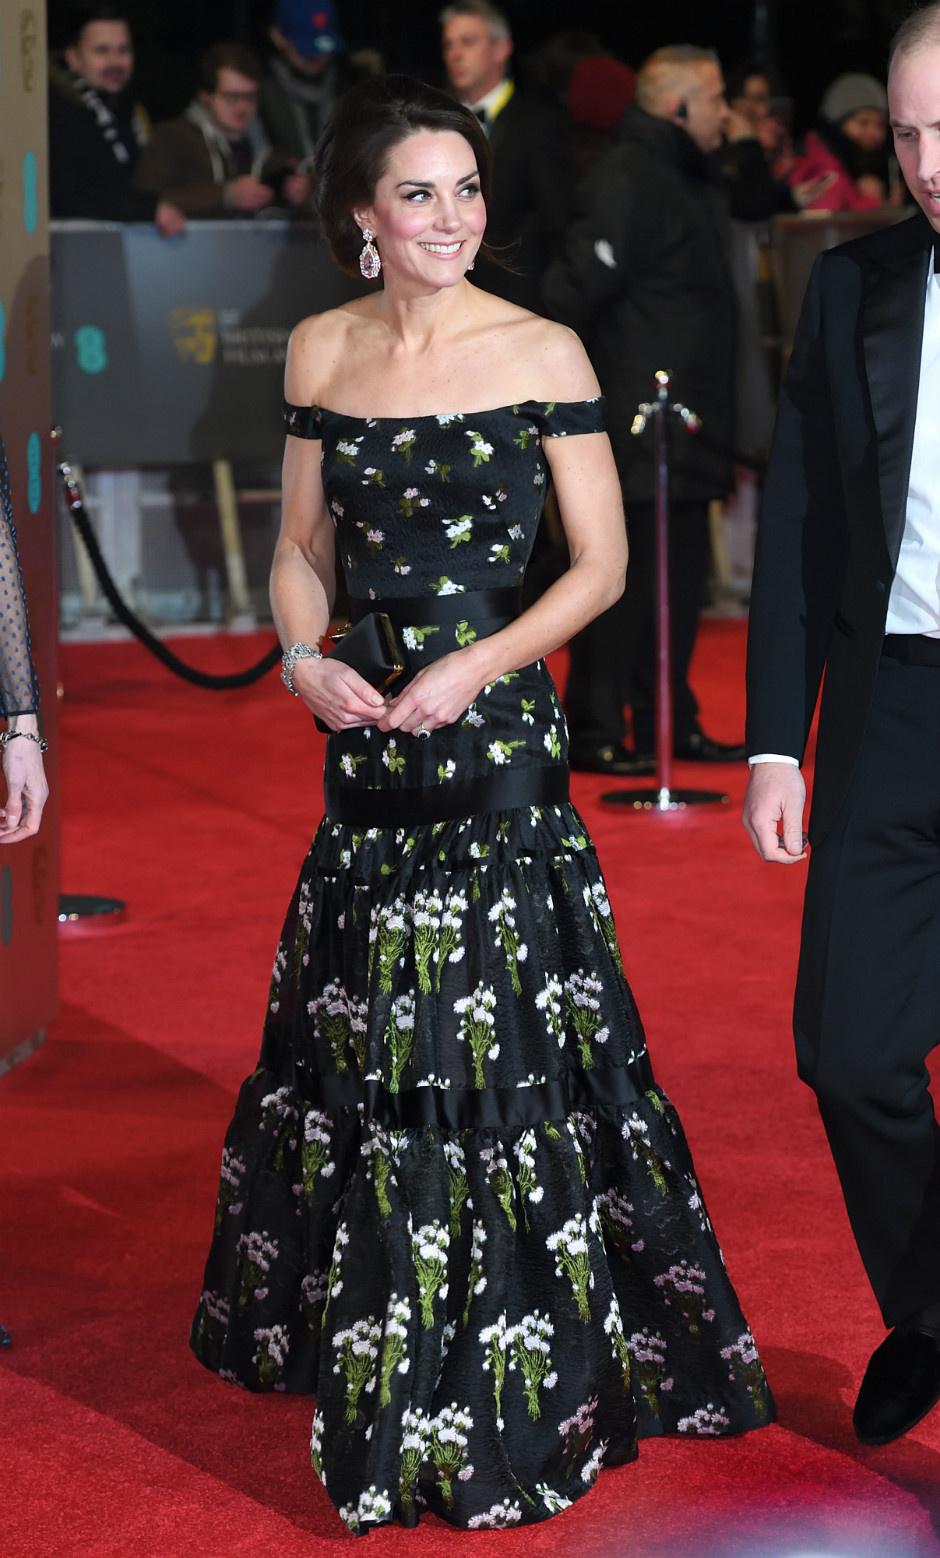 10 раз, когда Кейт Миддлтон пренебрегла королевским дресс-кодом фото [4]